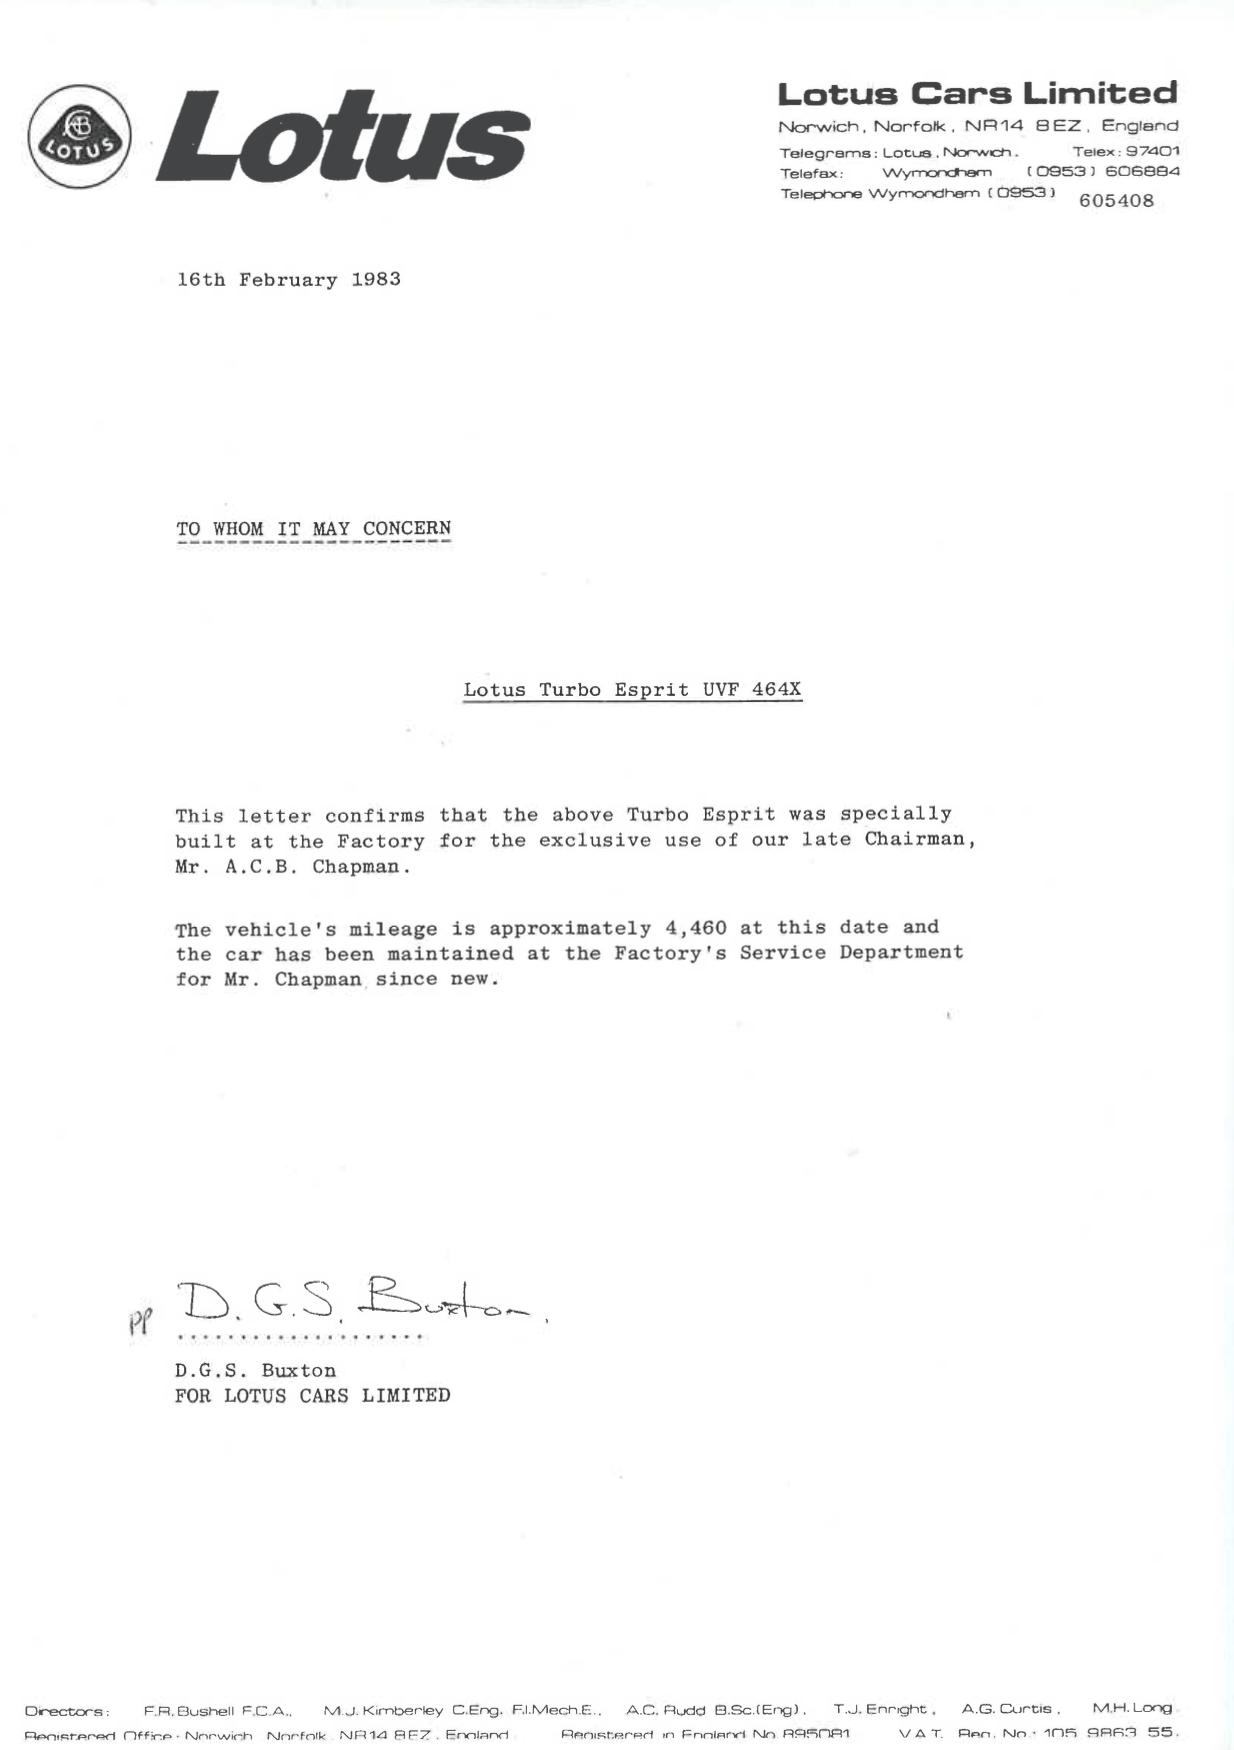 Lotus Esprit letter provenance certificate